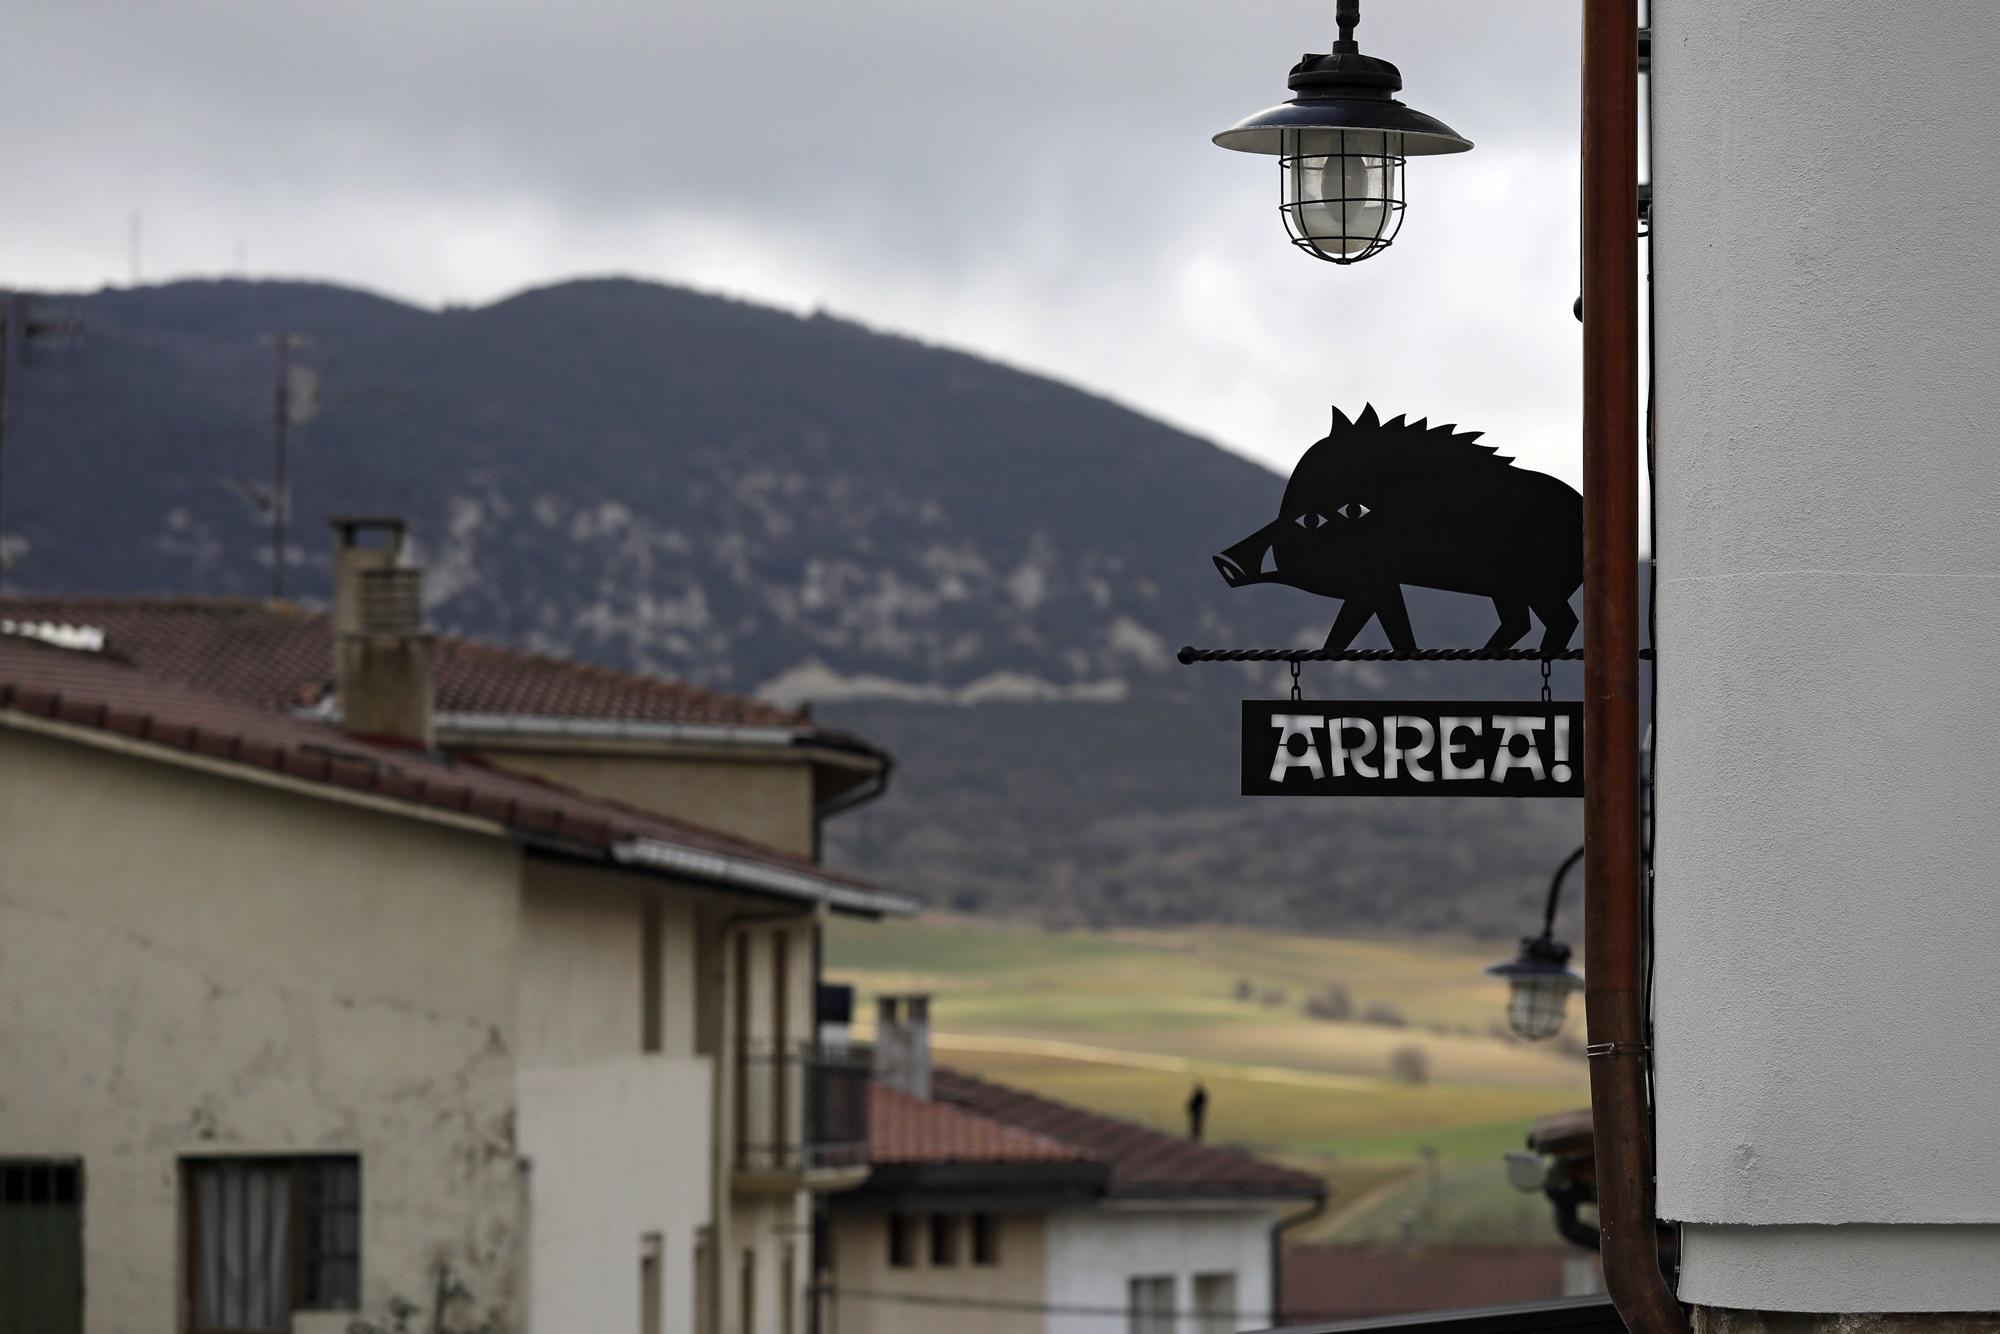 El monte Costalera se alza frente a 'Arrea!'.